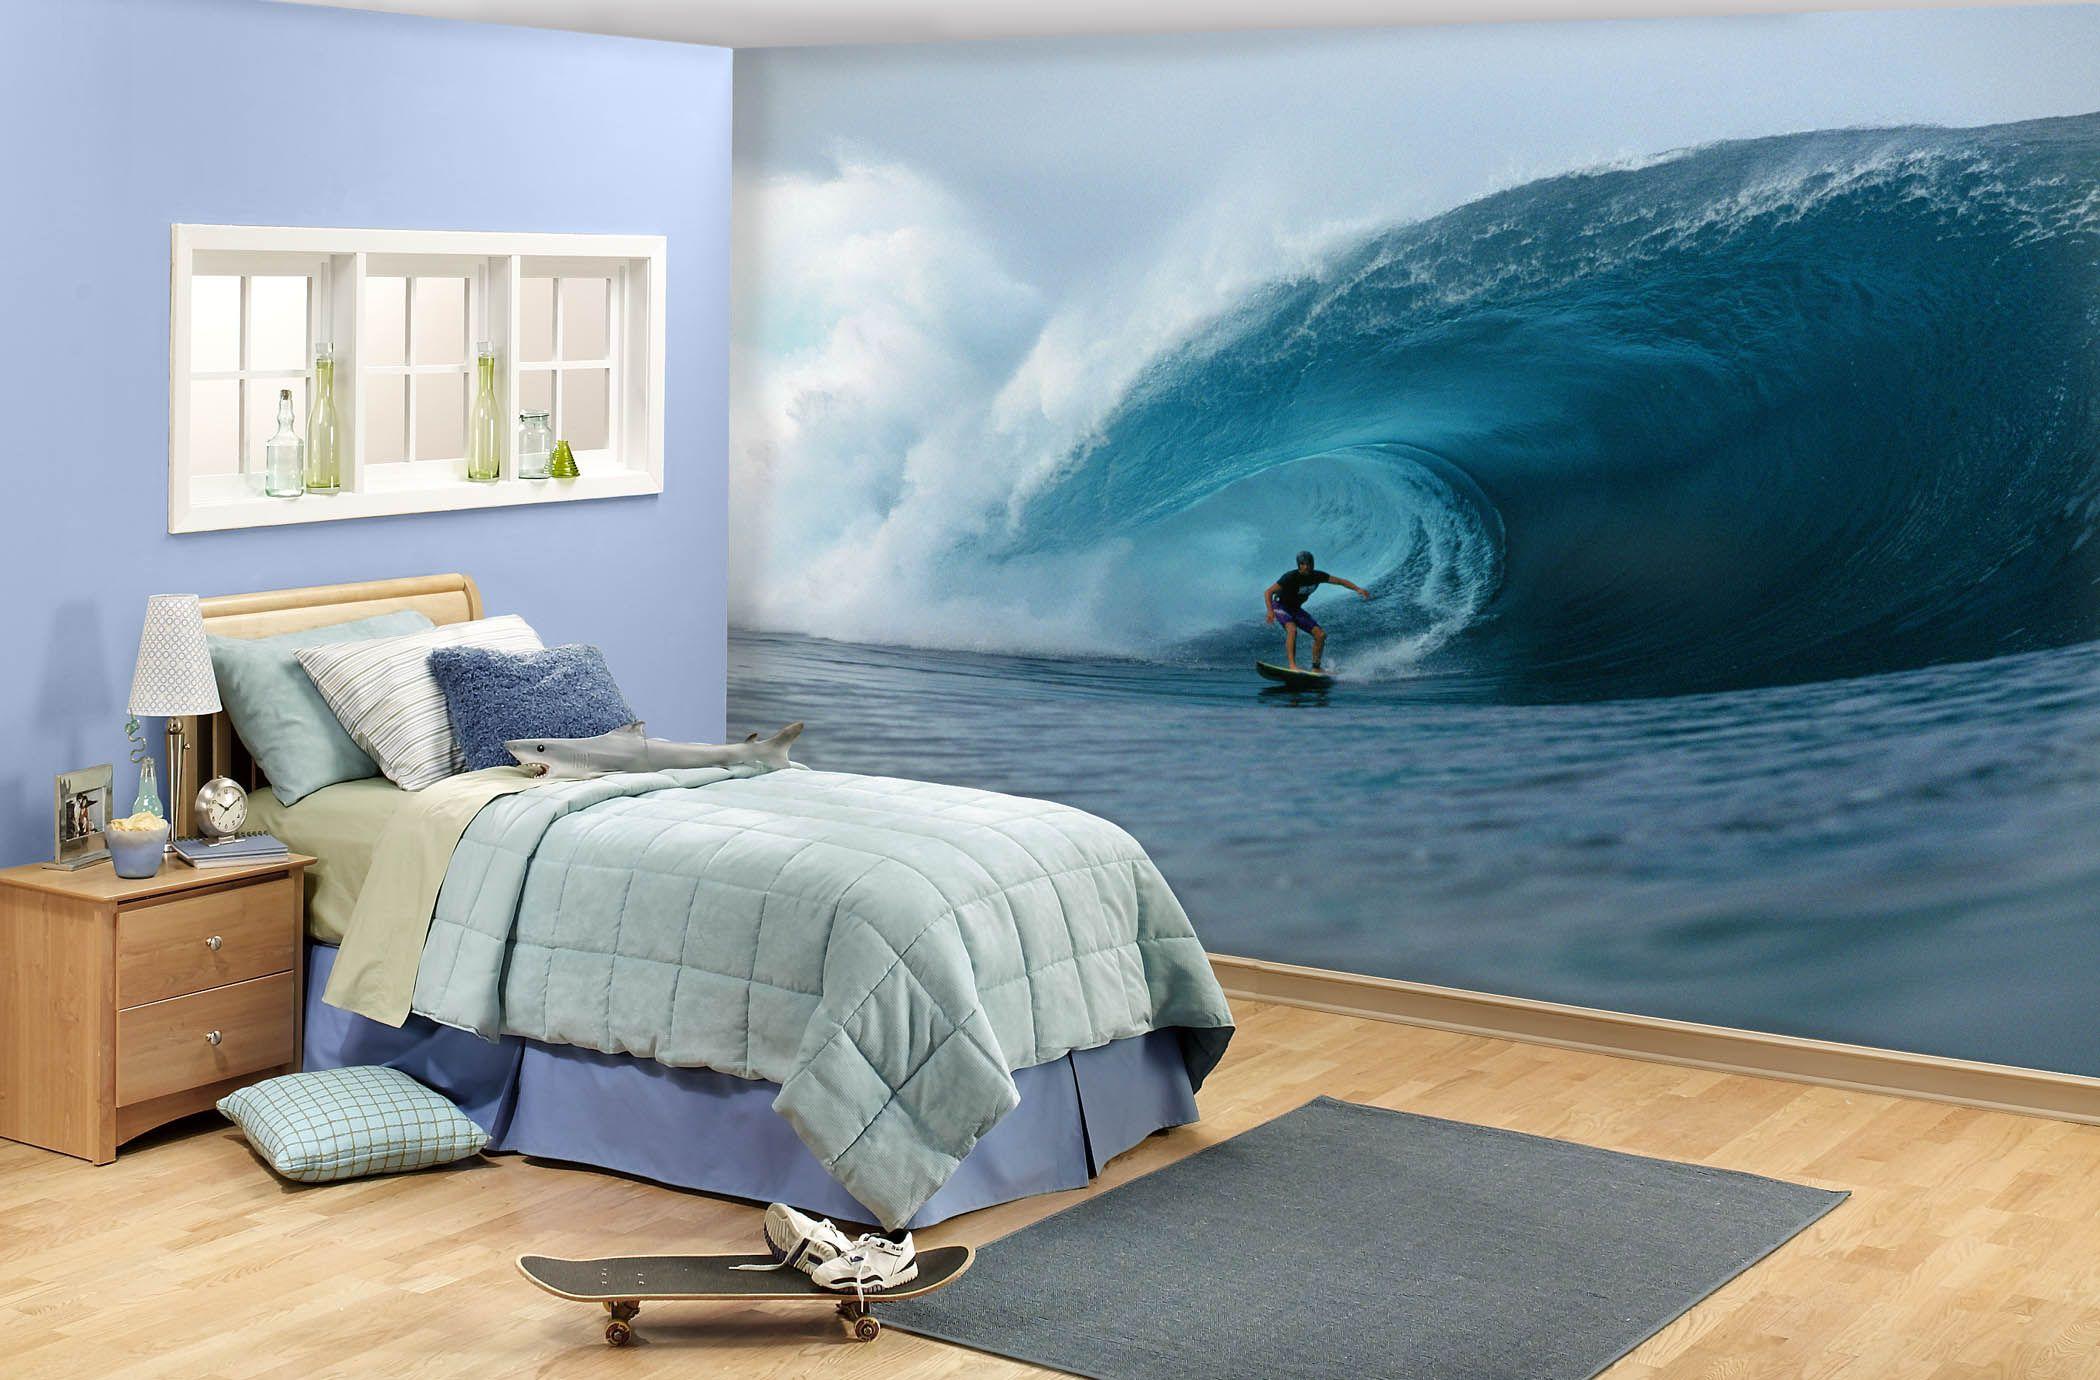 Sick wall.! I want